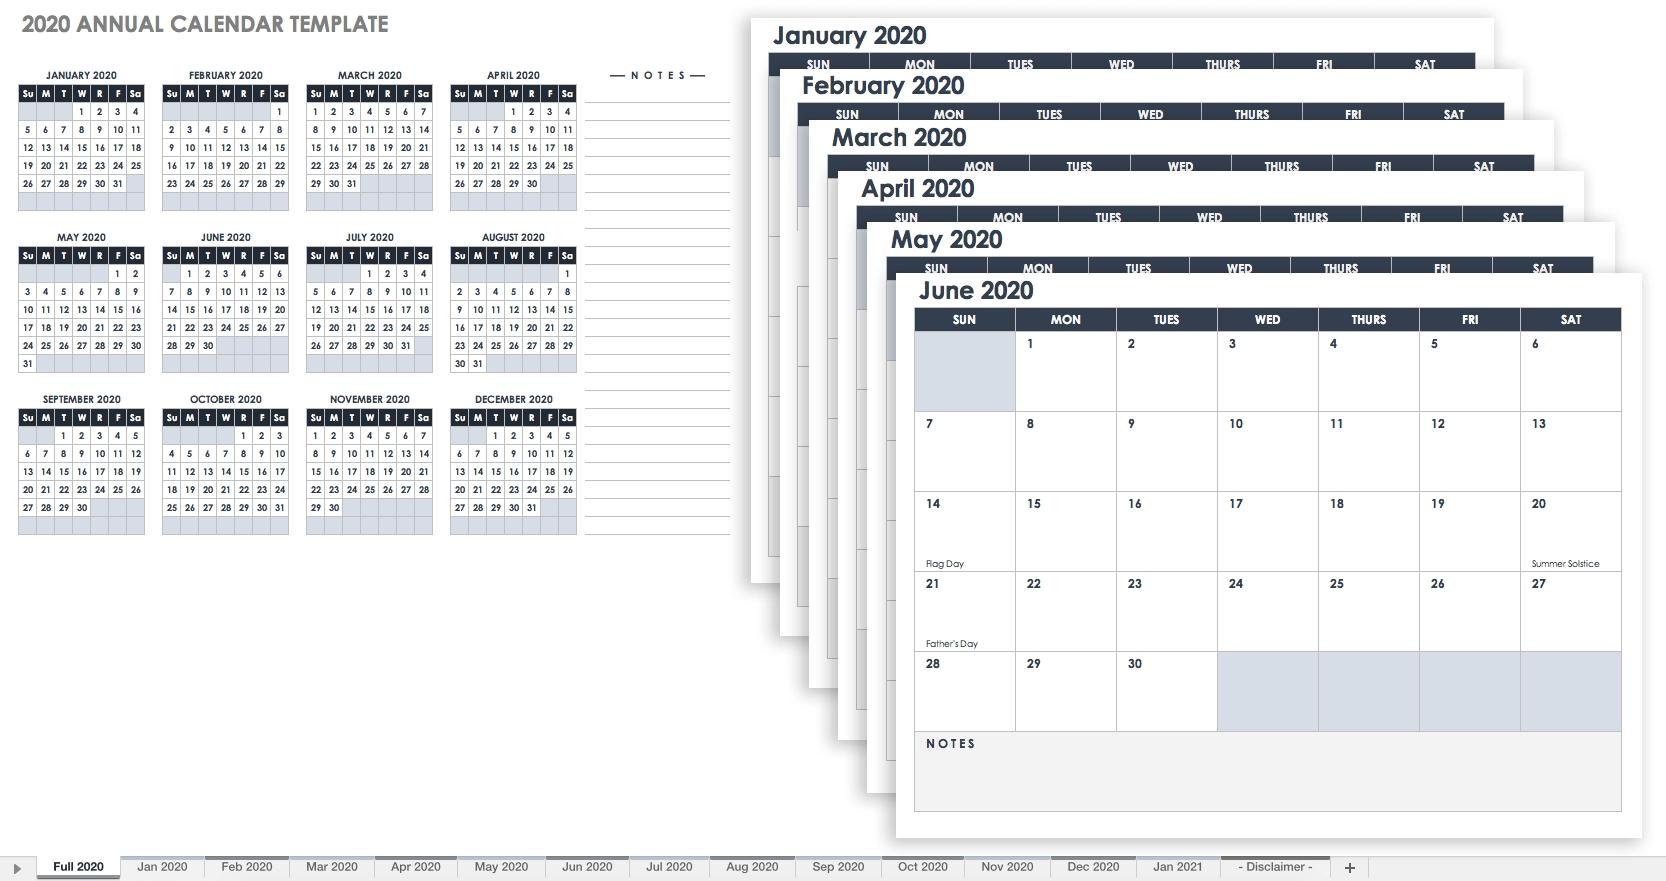 Free, Printable Excel Calendar Templates For 2019 & On | Smartsheet within Employee Attendance Calendar 2020 Prntable